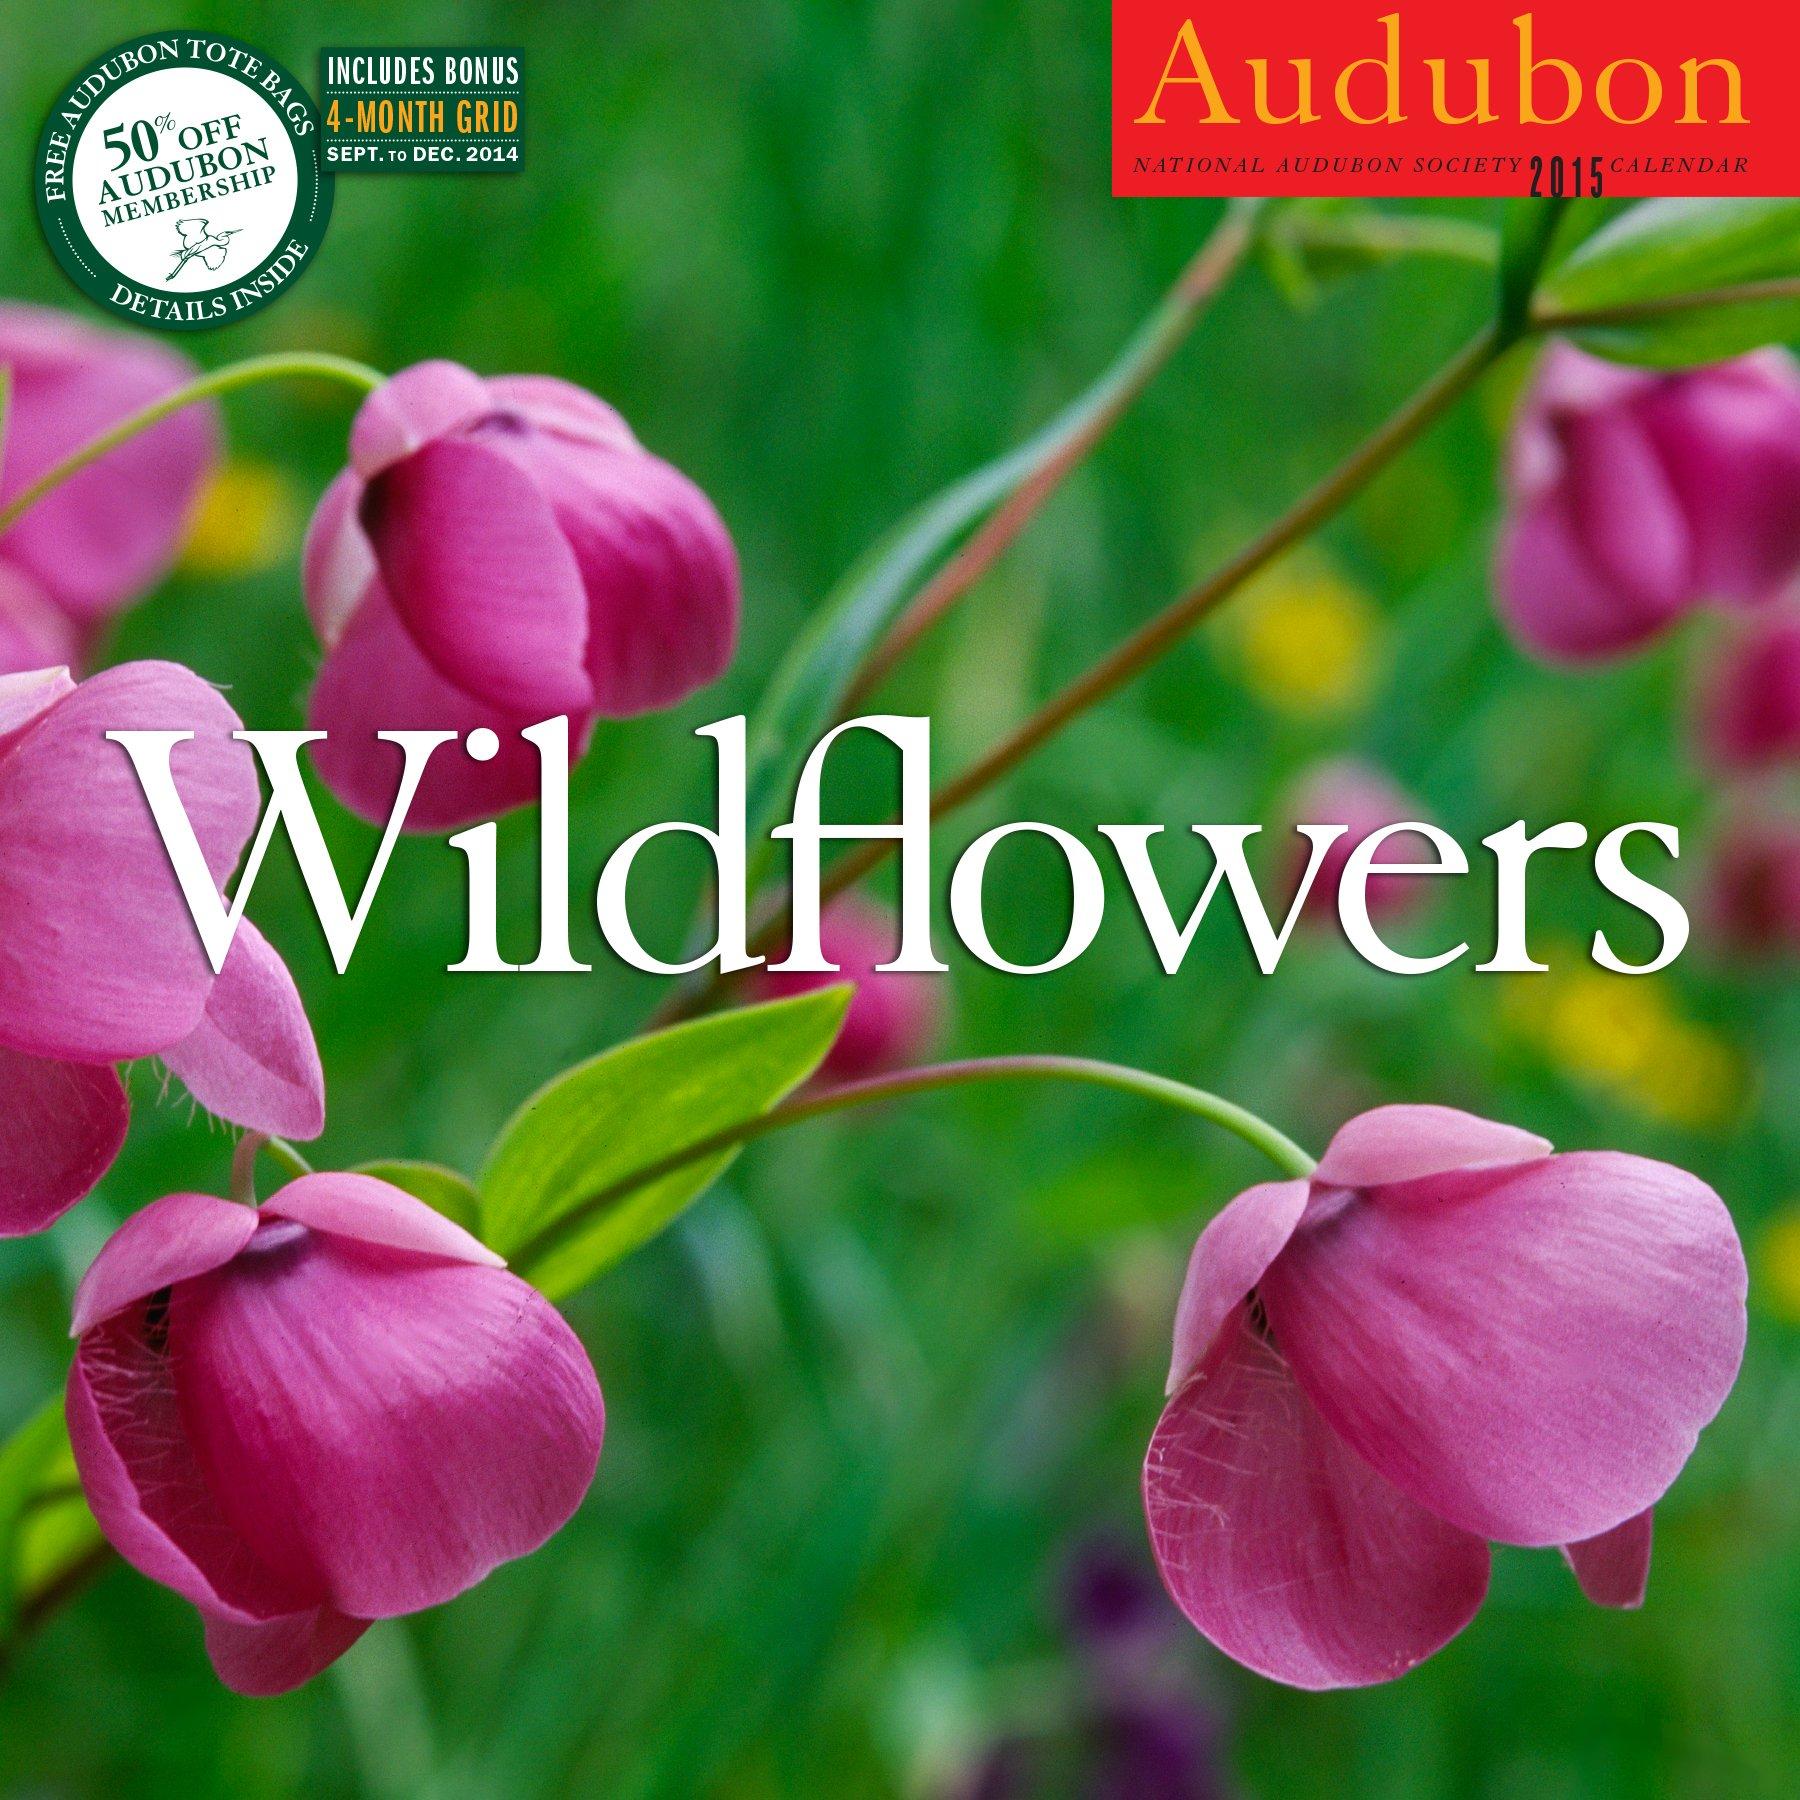 Audubon Wildflowers Calendar 2015 Calendar – Wall Calendar, July 21, 2014 National Audubon Society Artisan 1579655750 Calendars